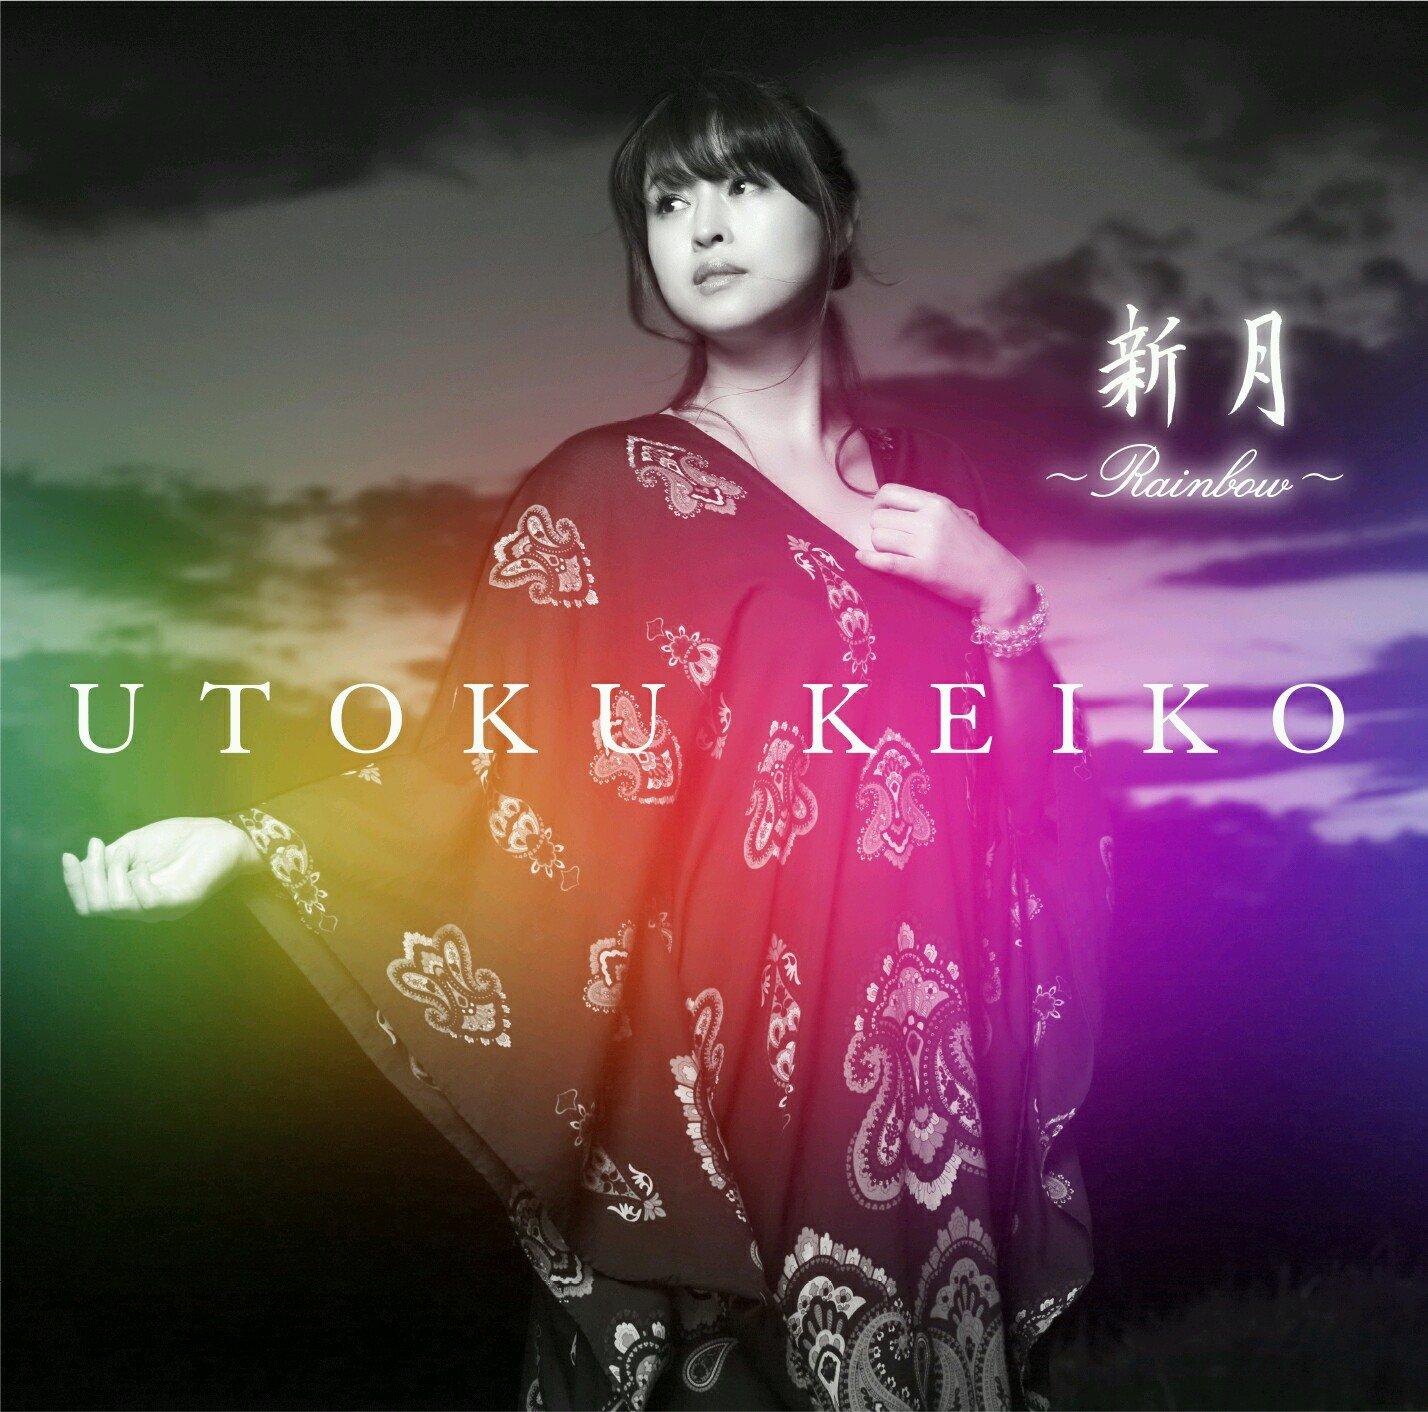 Utoku Keiko